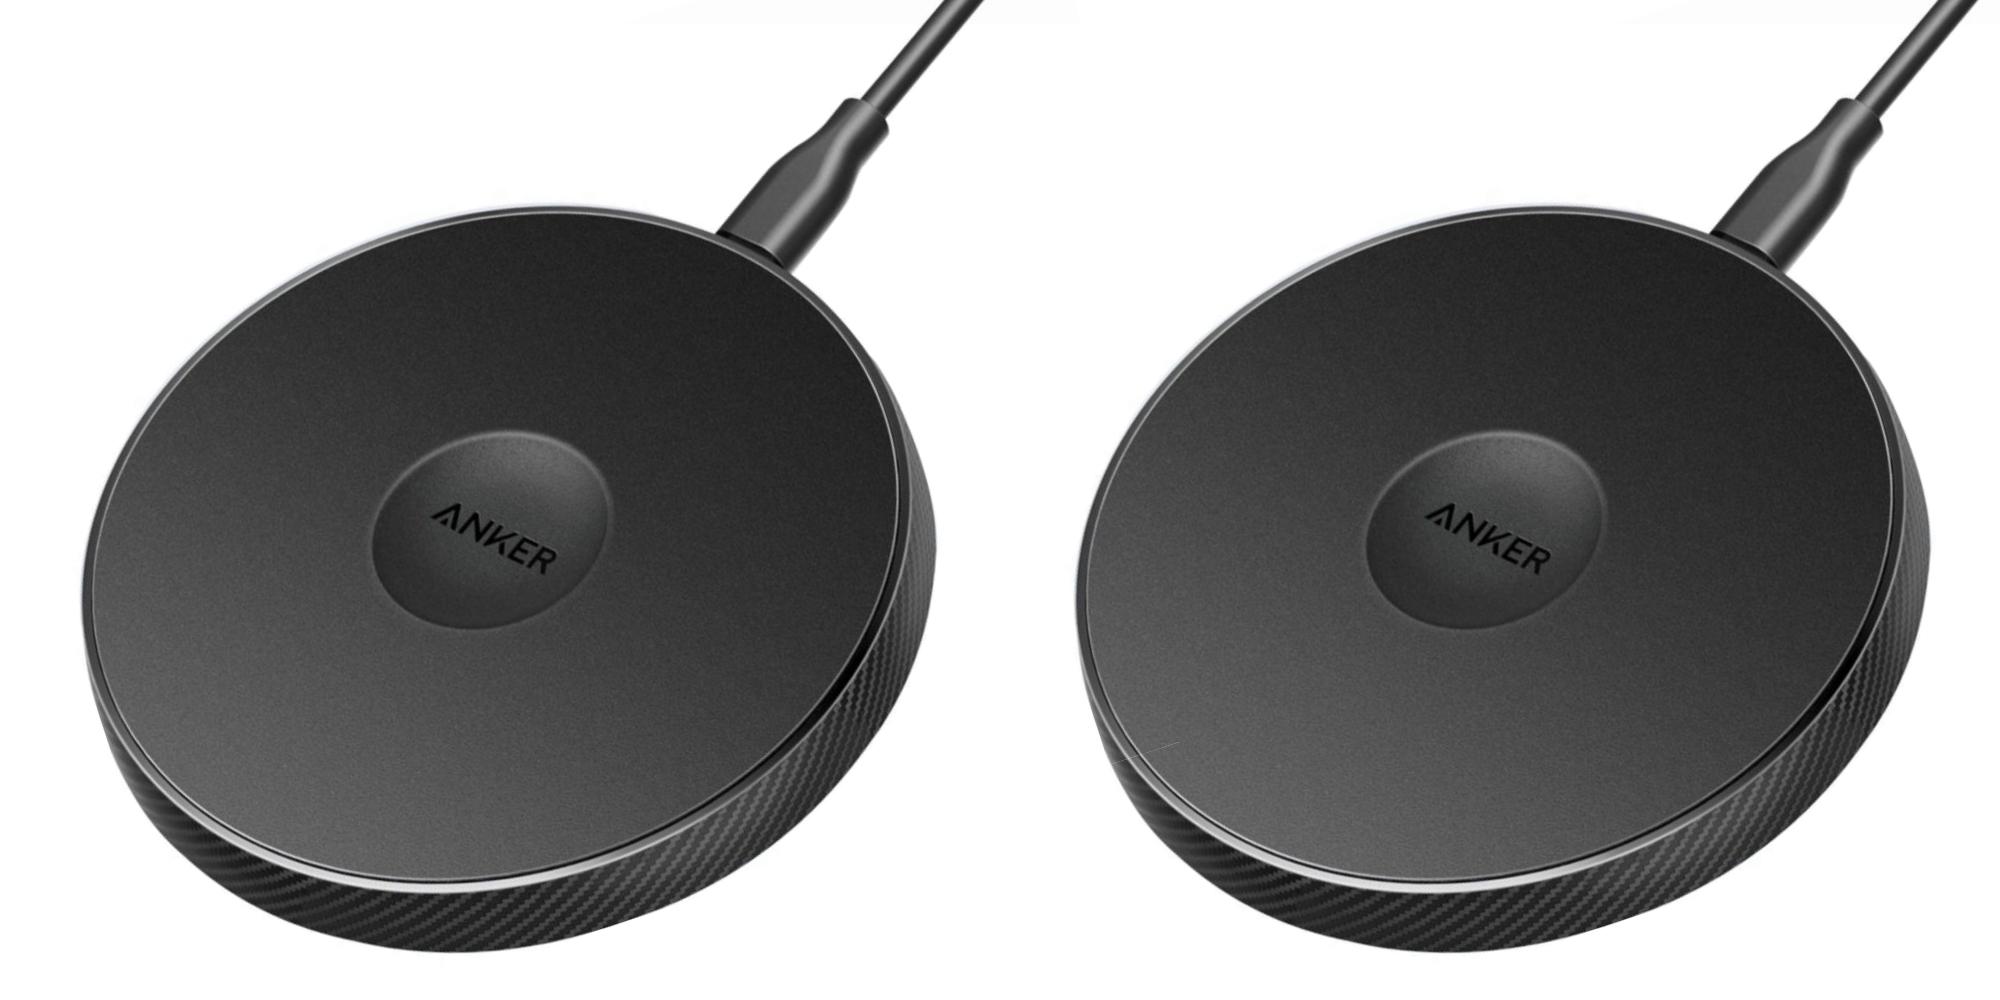 9to5Toys Letzter Anruf: Google Wifi Drei-Pack 207, Yale versichern Smart Deadbolt 122, Anker 5W Qi-Ladegerät 20, mehr